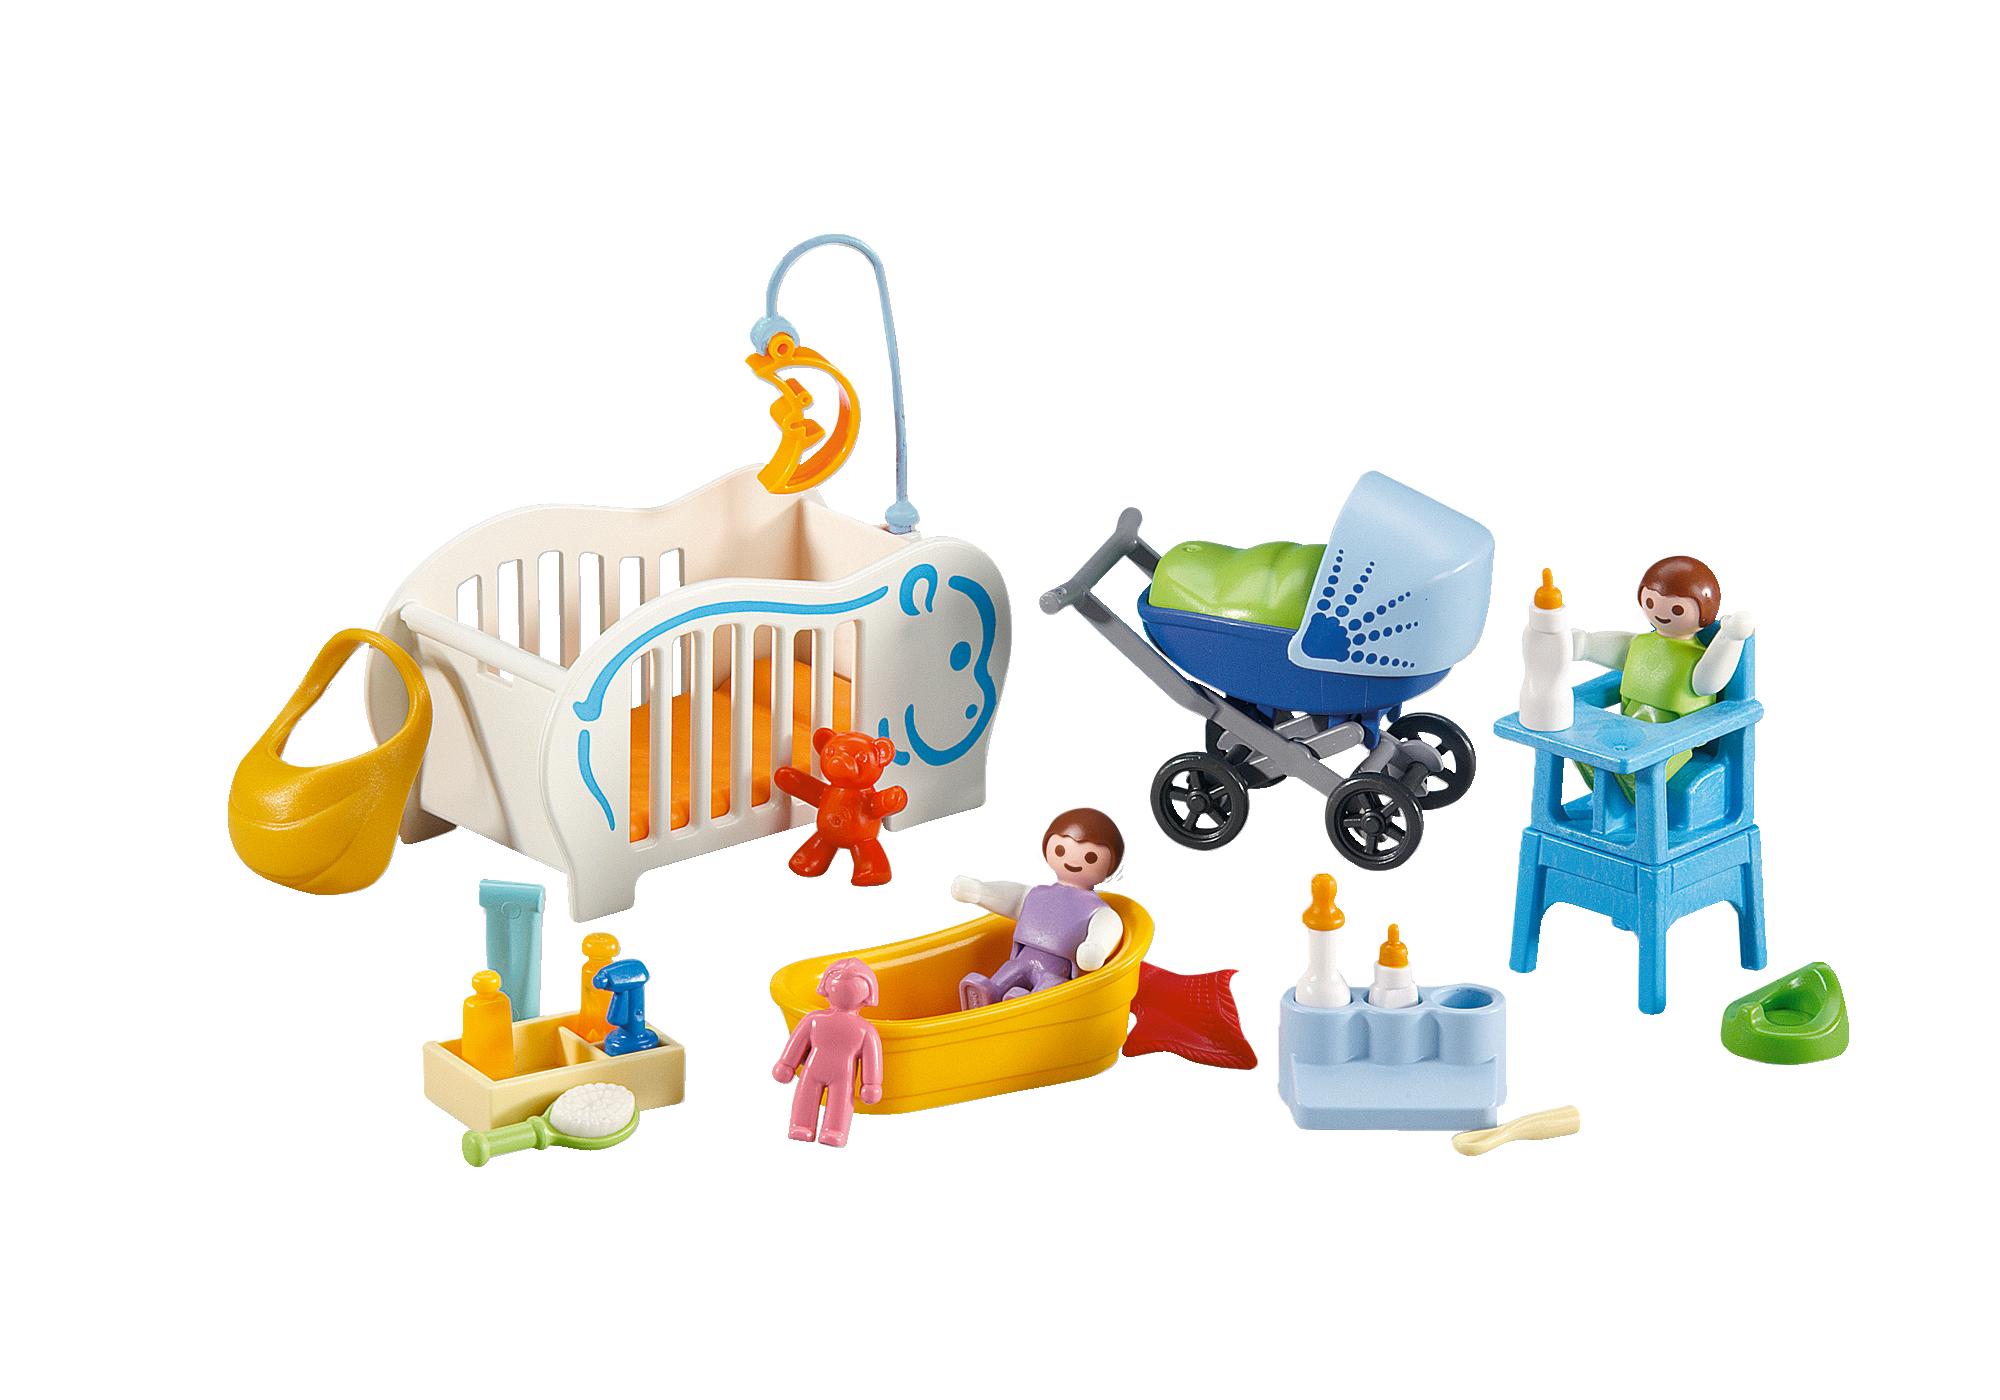 http://media.playmobil.com/i/playmobil/6226_product_detail/Set prima infanzia